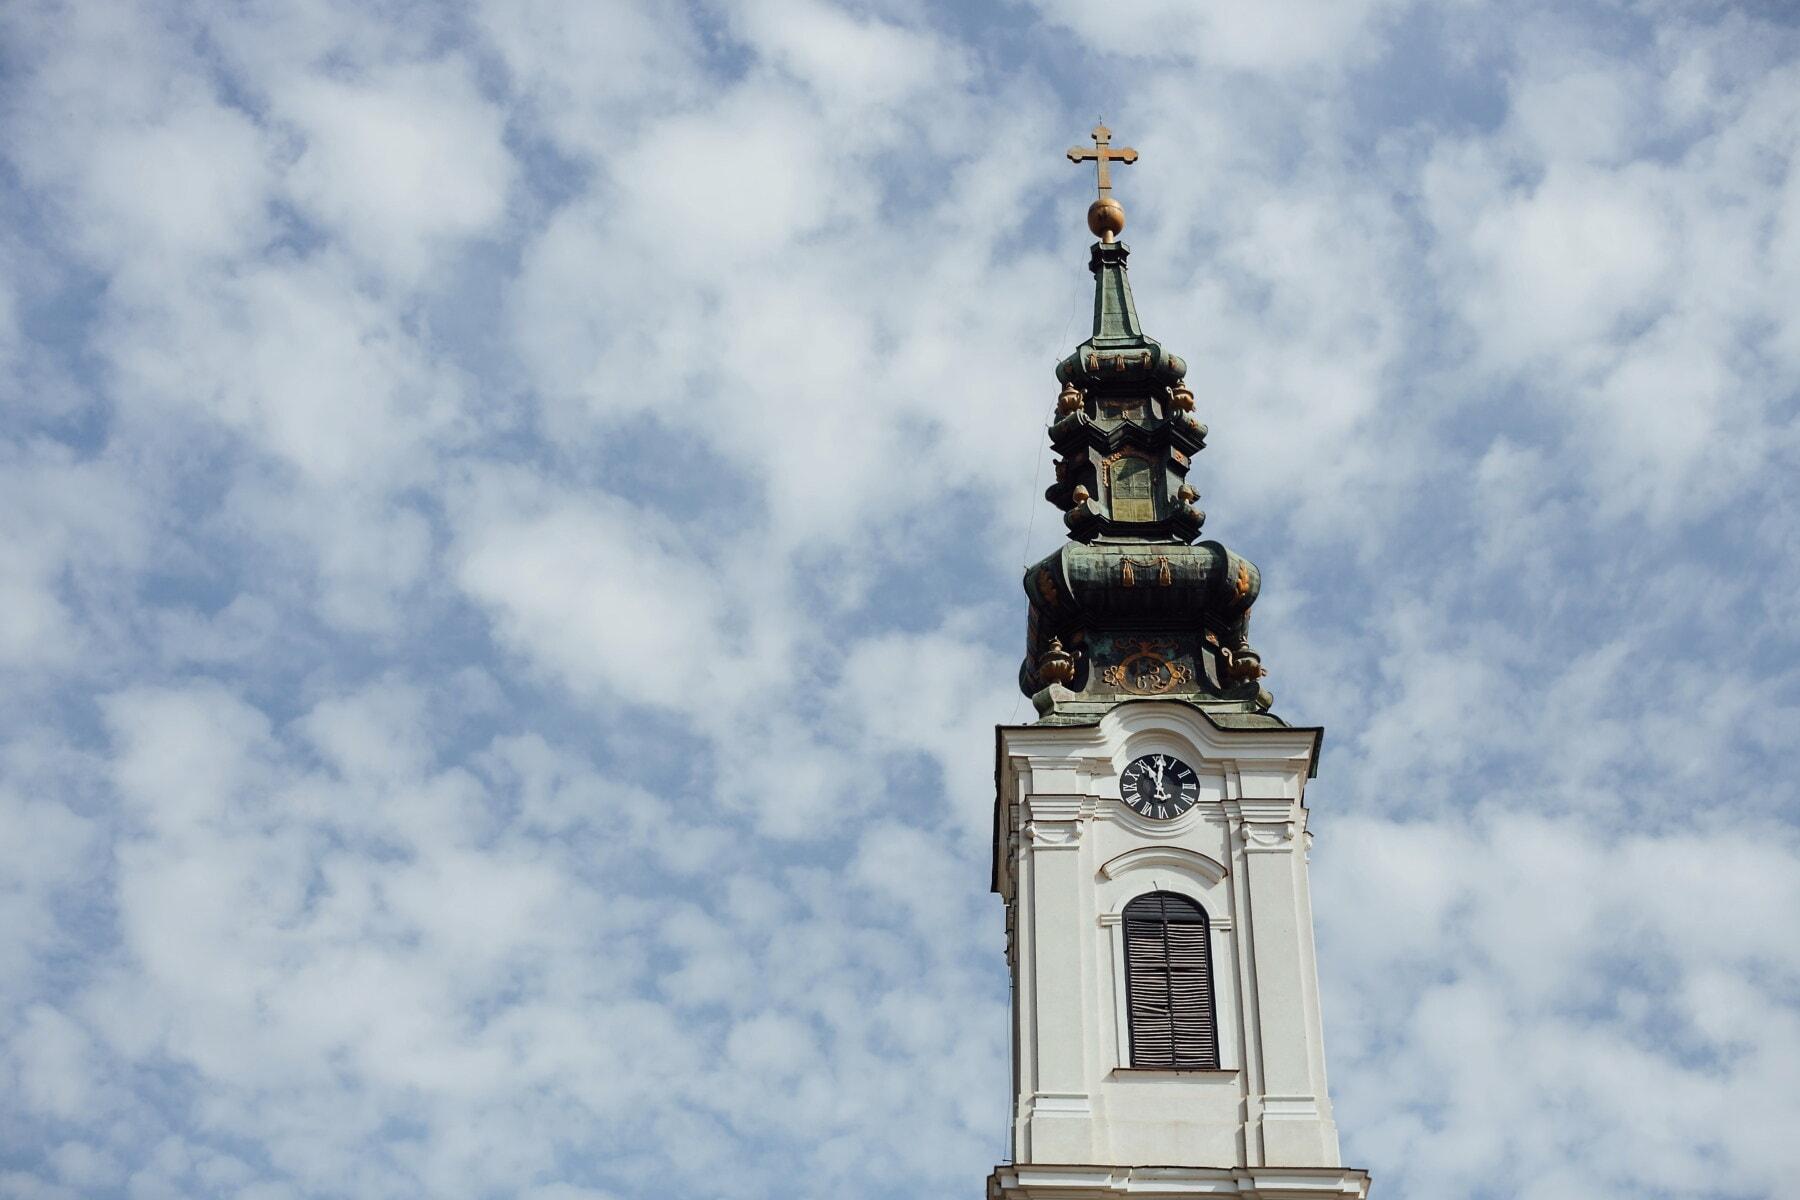 Backa Palanka orthodox church, church, tower, white, analog clock, architecture, traditional, religion, old